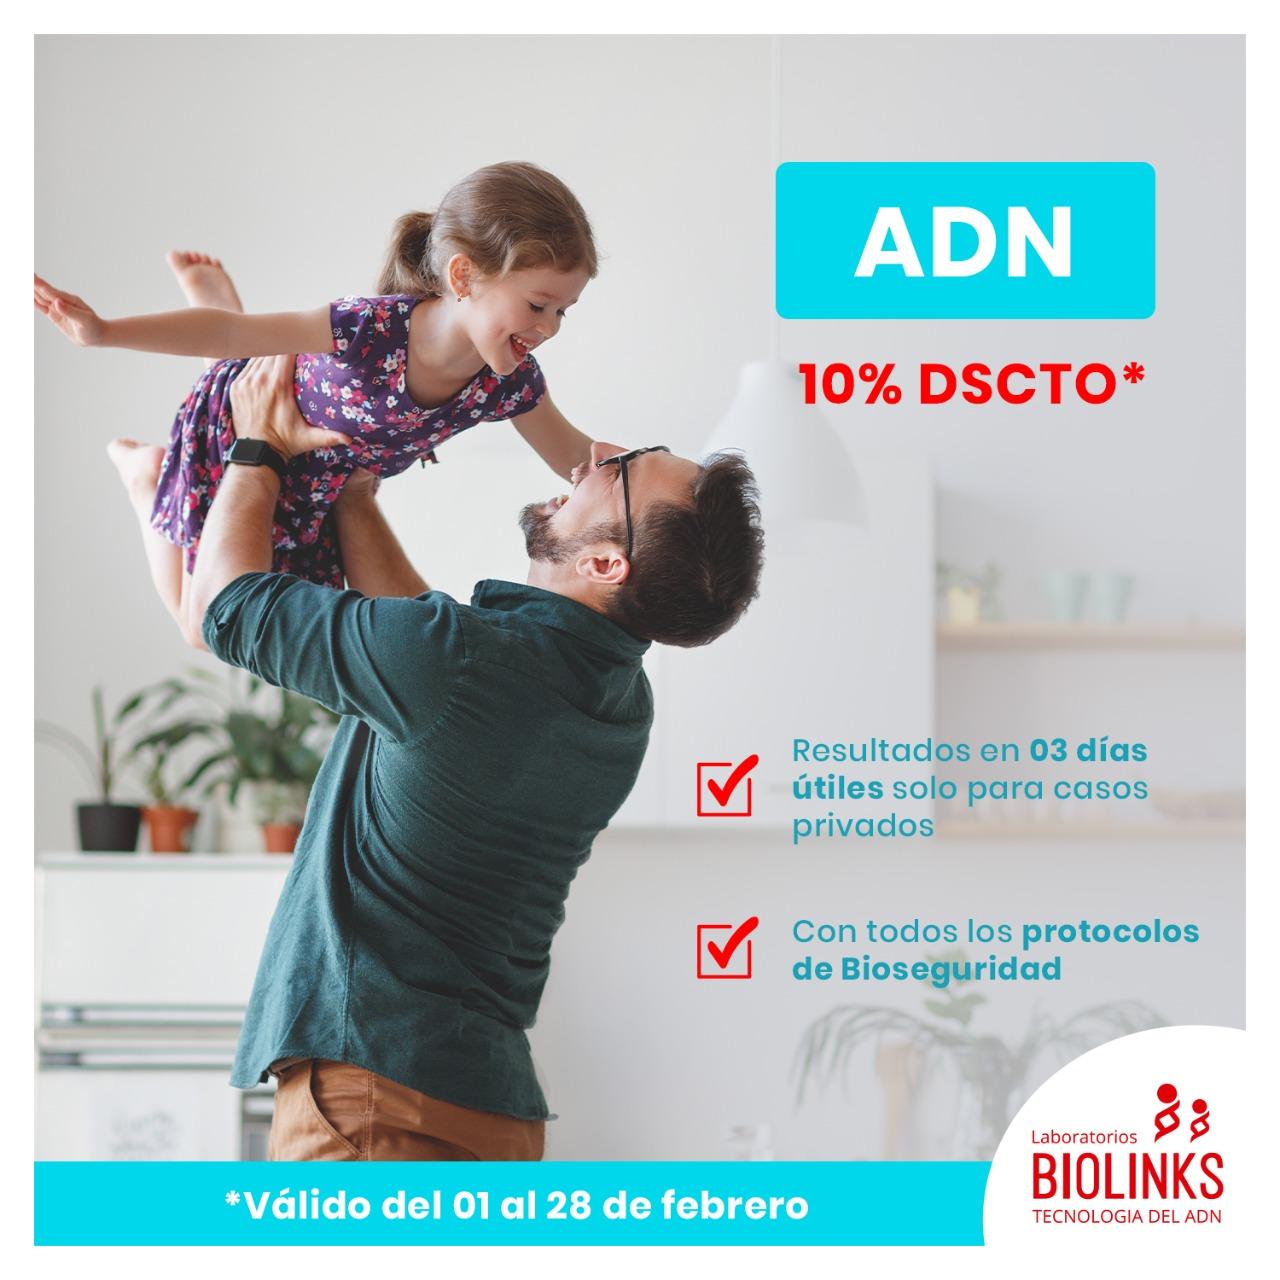 promocion adn biolinks